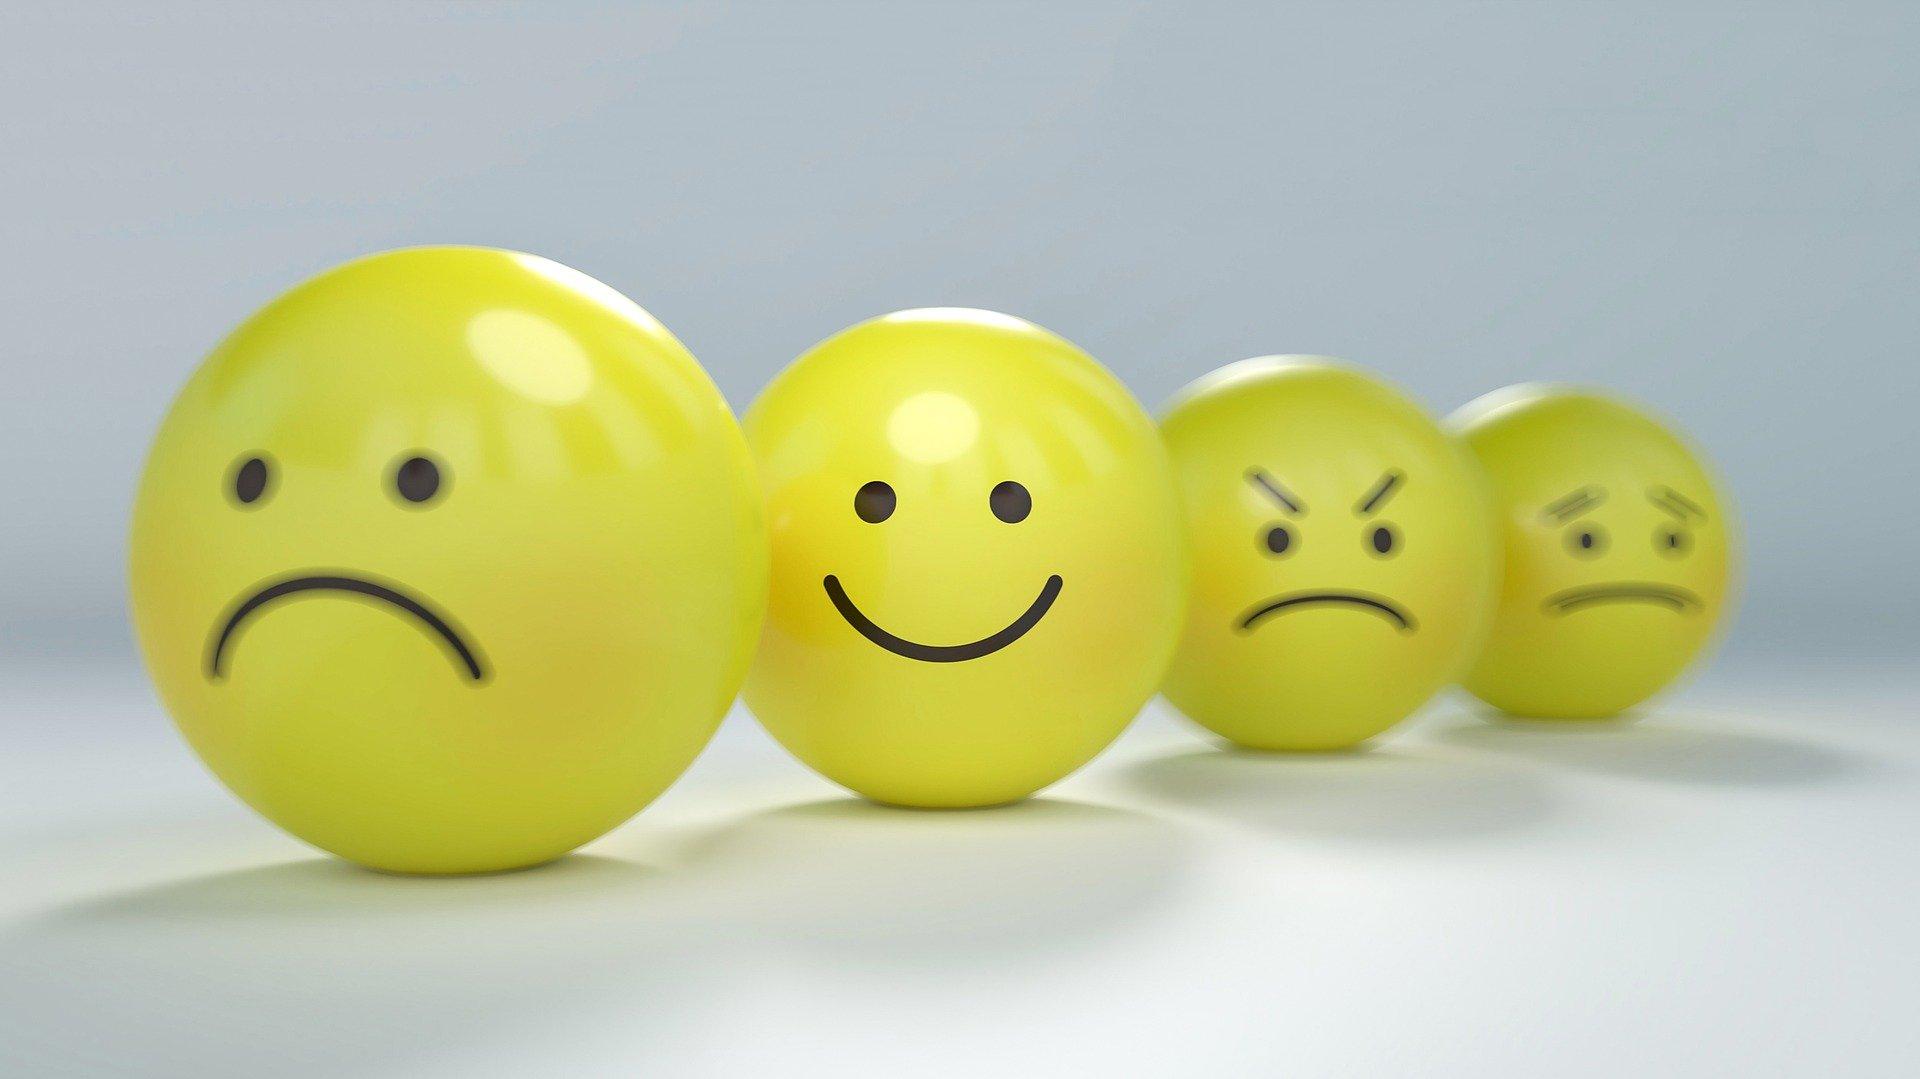 2021-04-24 Pixabay Gino Crescoli-Smiley-2979107_1920